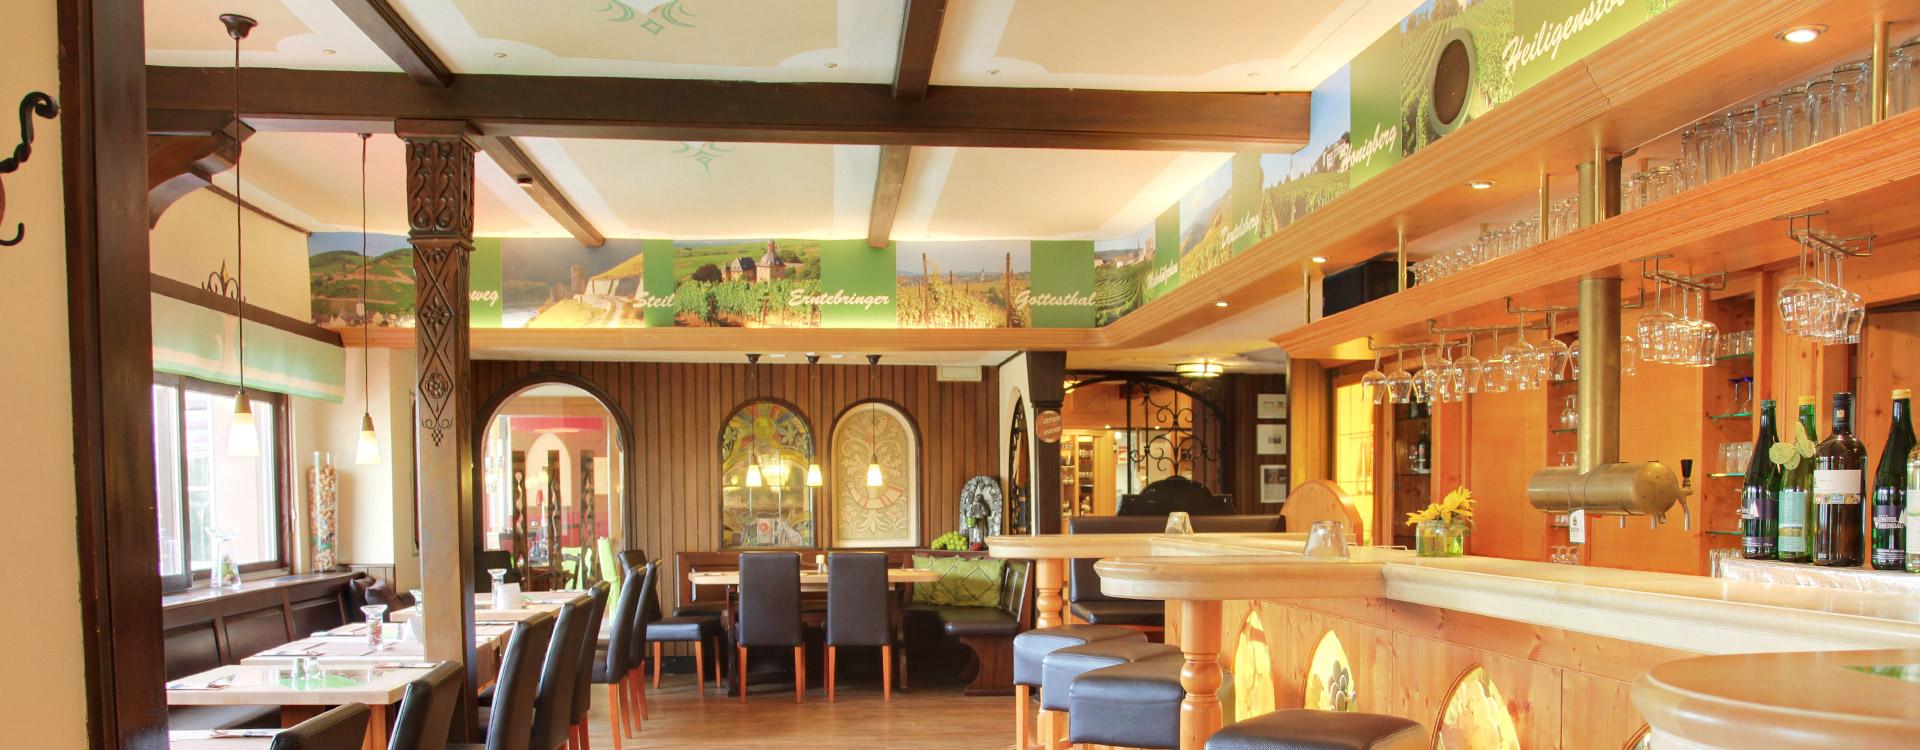 akzent_waldhotel_rheingau_geisenheim_restaurant_rebenbar_01